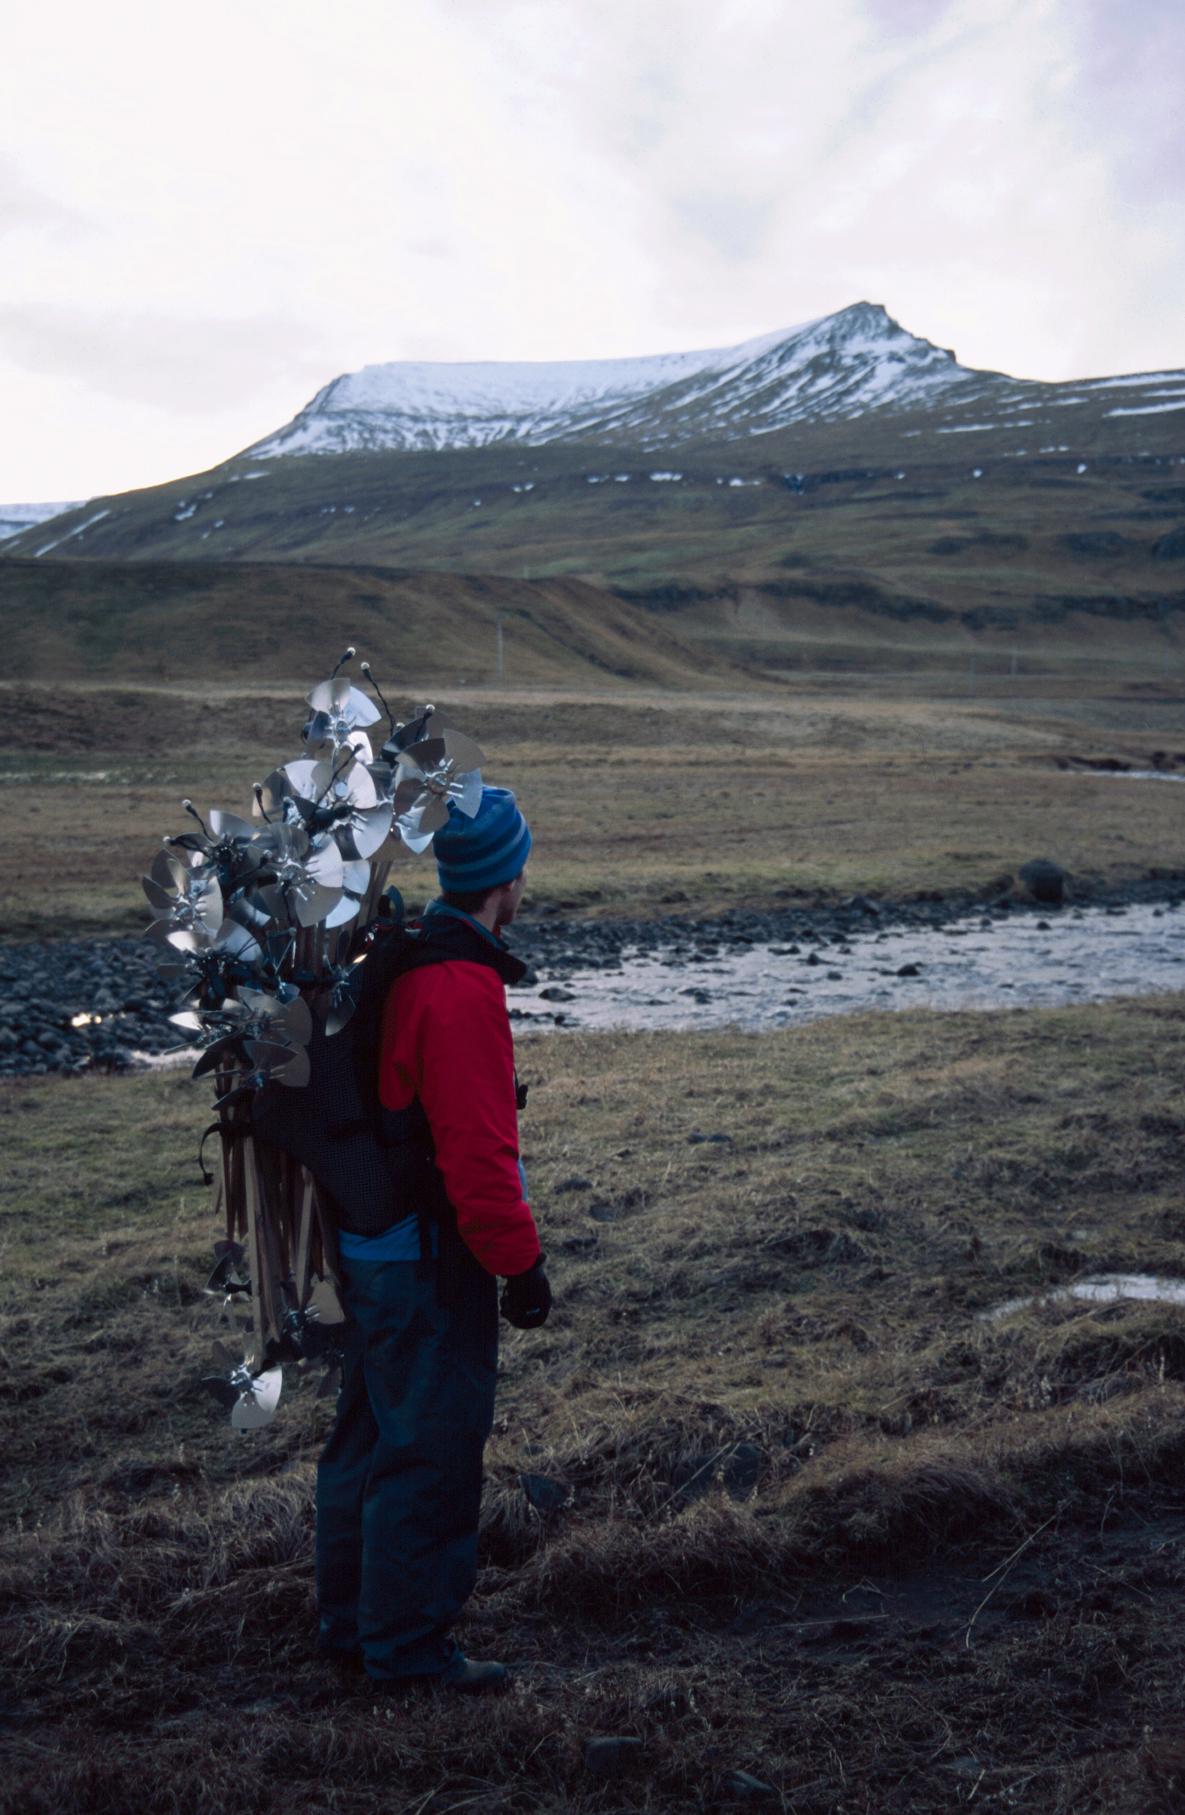 Patrick Marold, Iceland